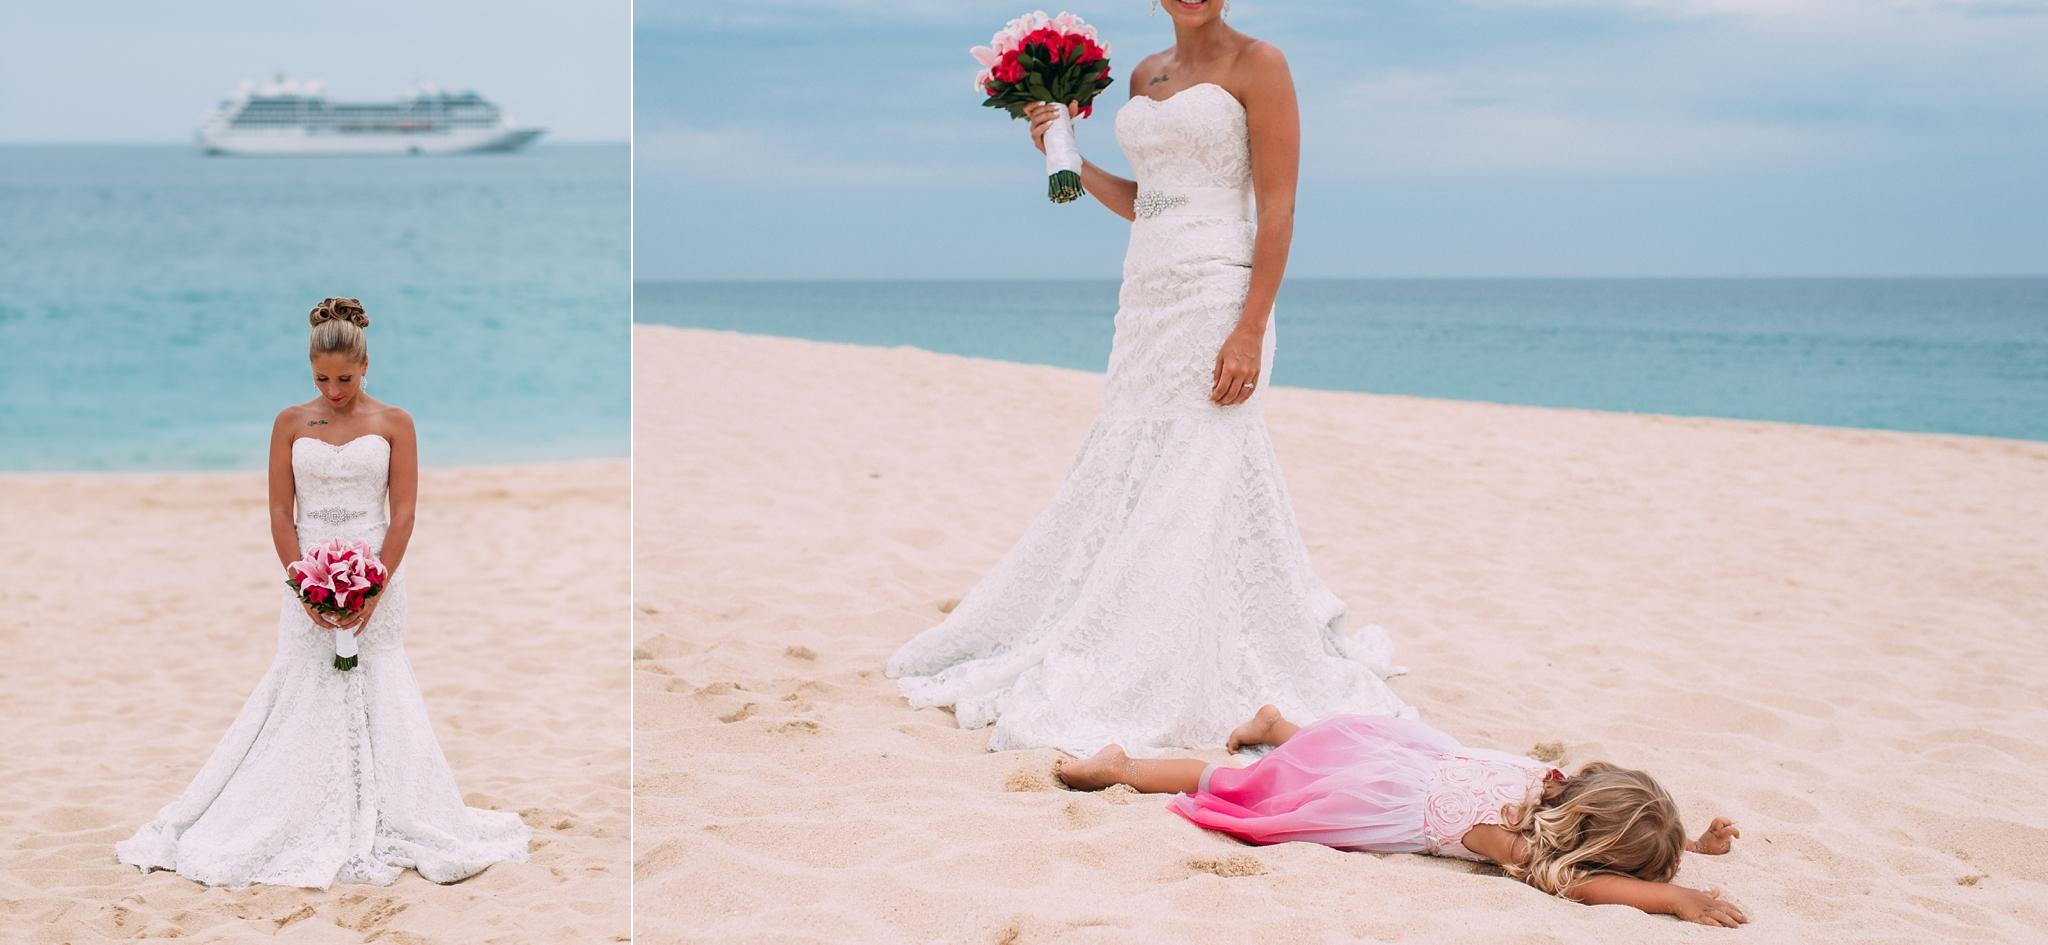 kaihla_tonai_intimate_wedding_elopement_photographer_1393